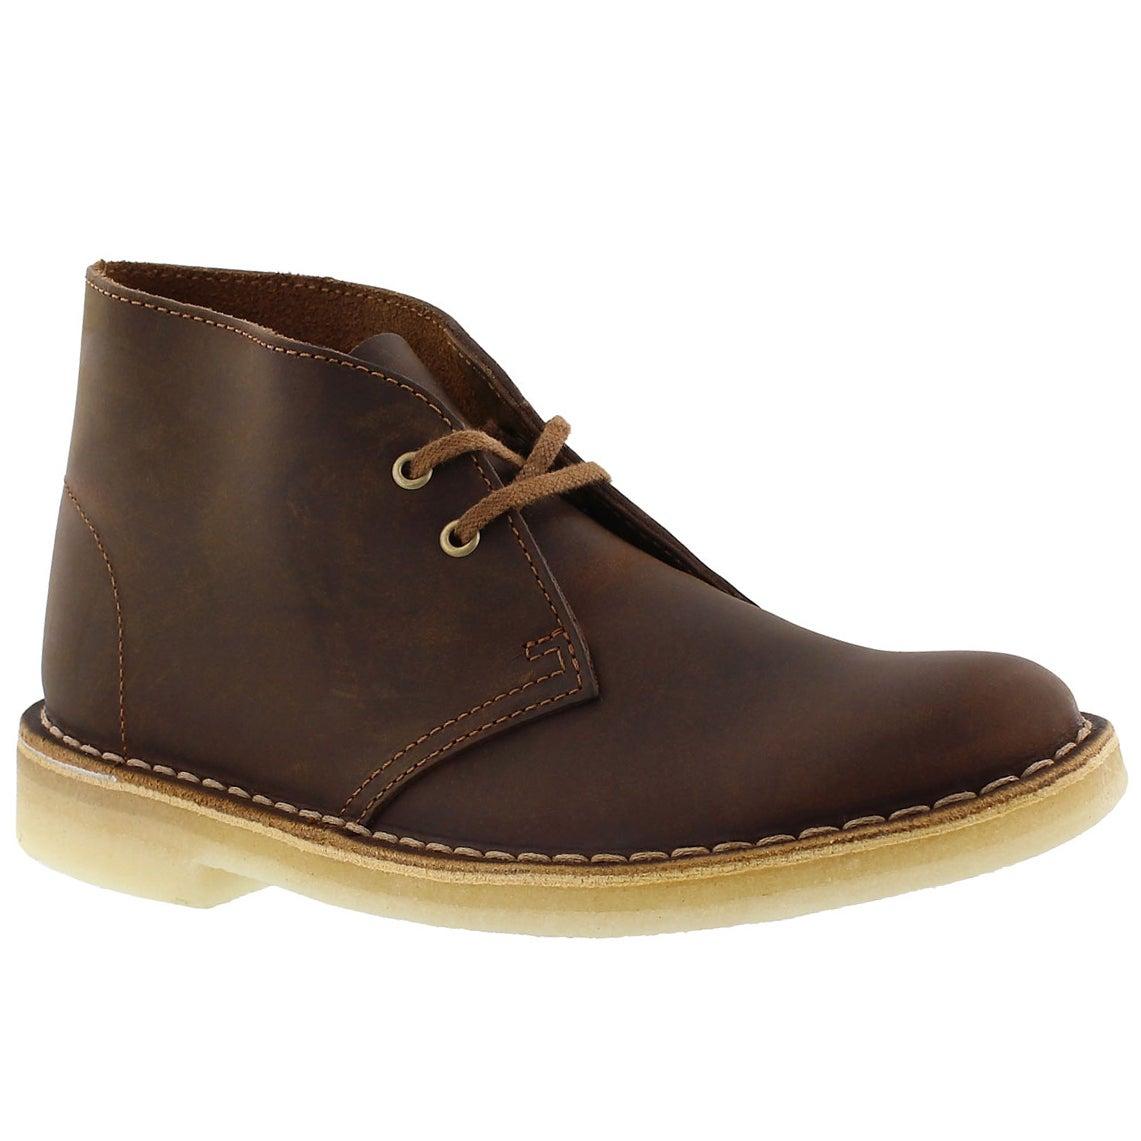 Lds Originals Desert Boot beeswax lea